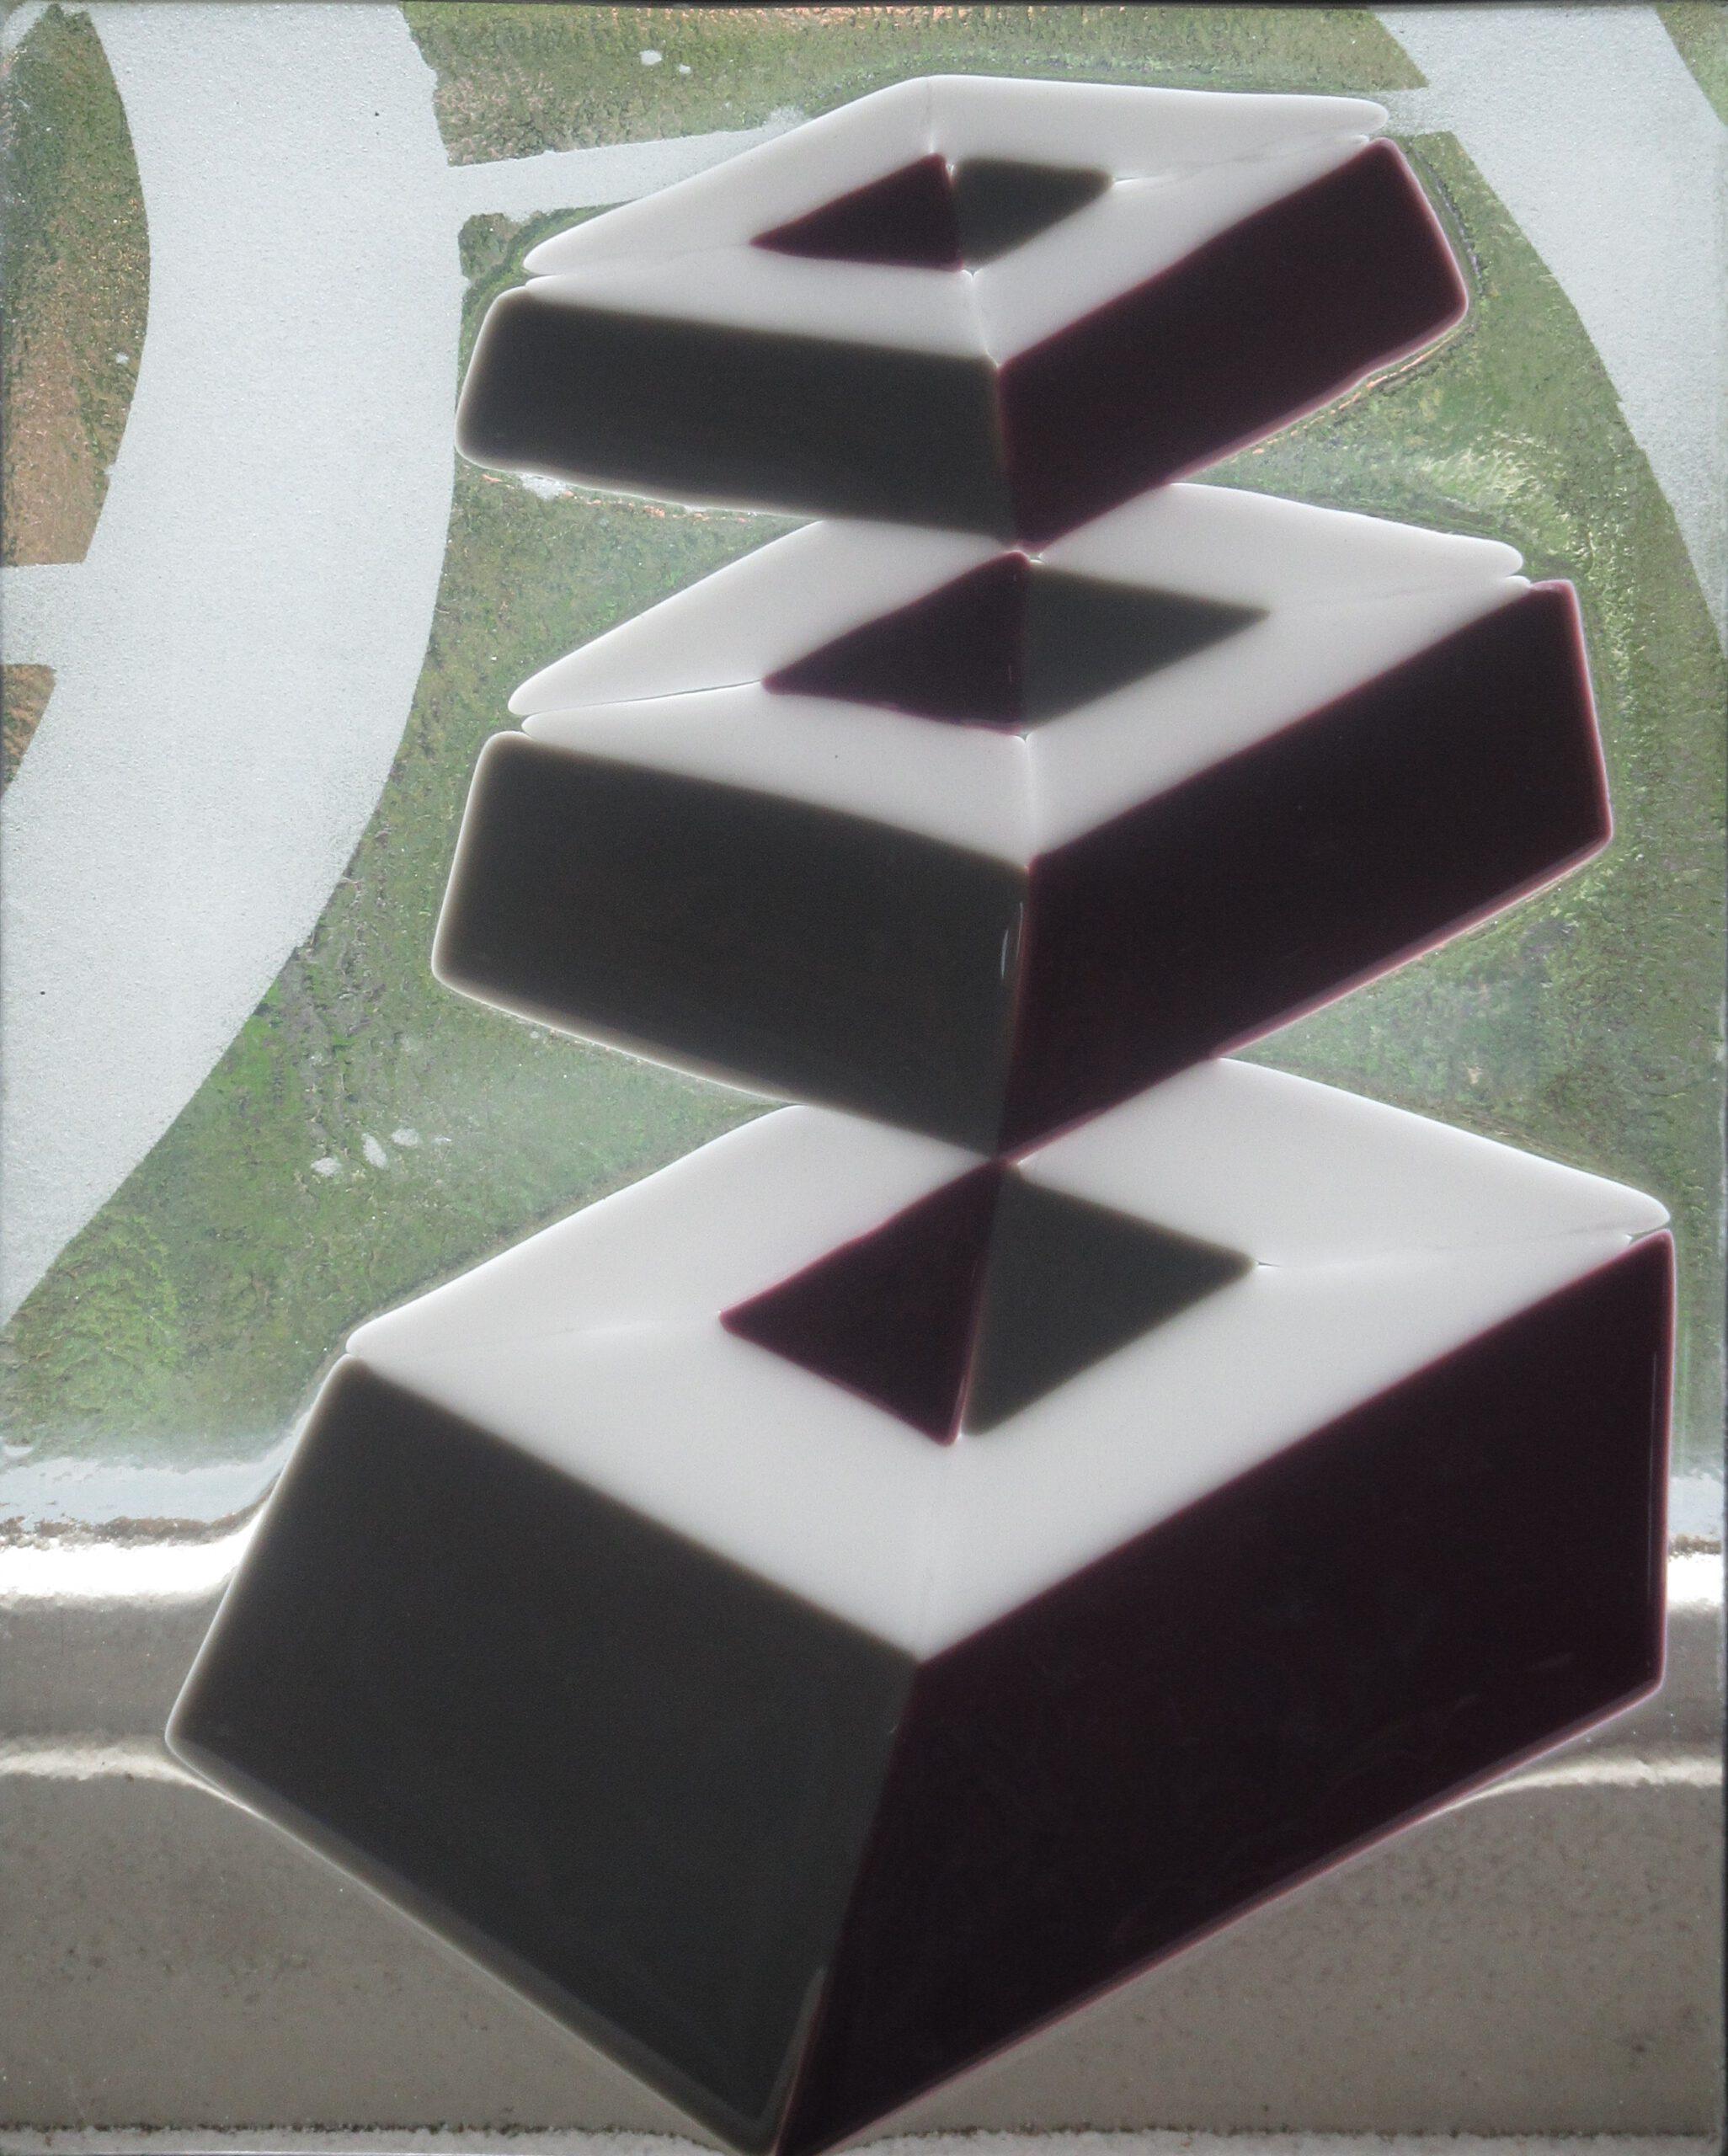 Glazen paneel dmv glasfusing fusion gemaakt